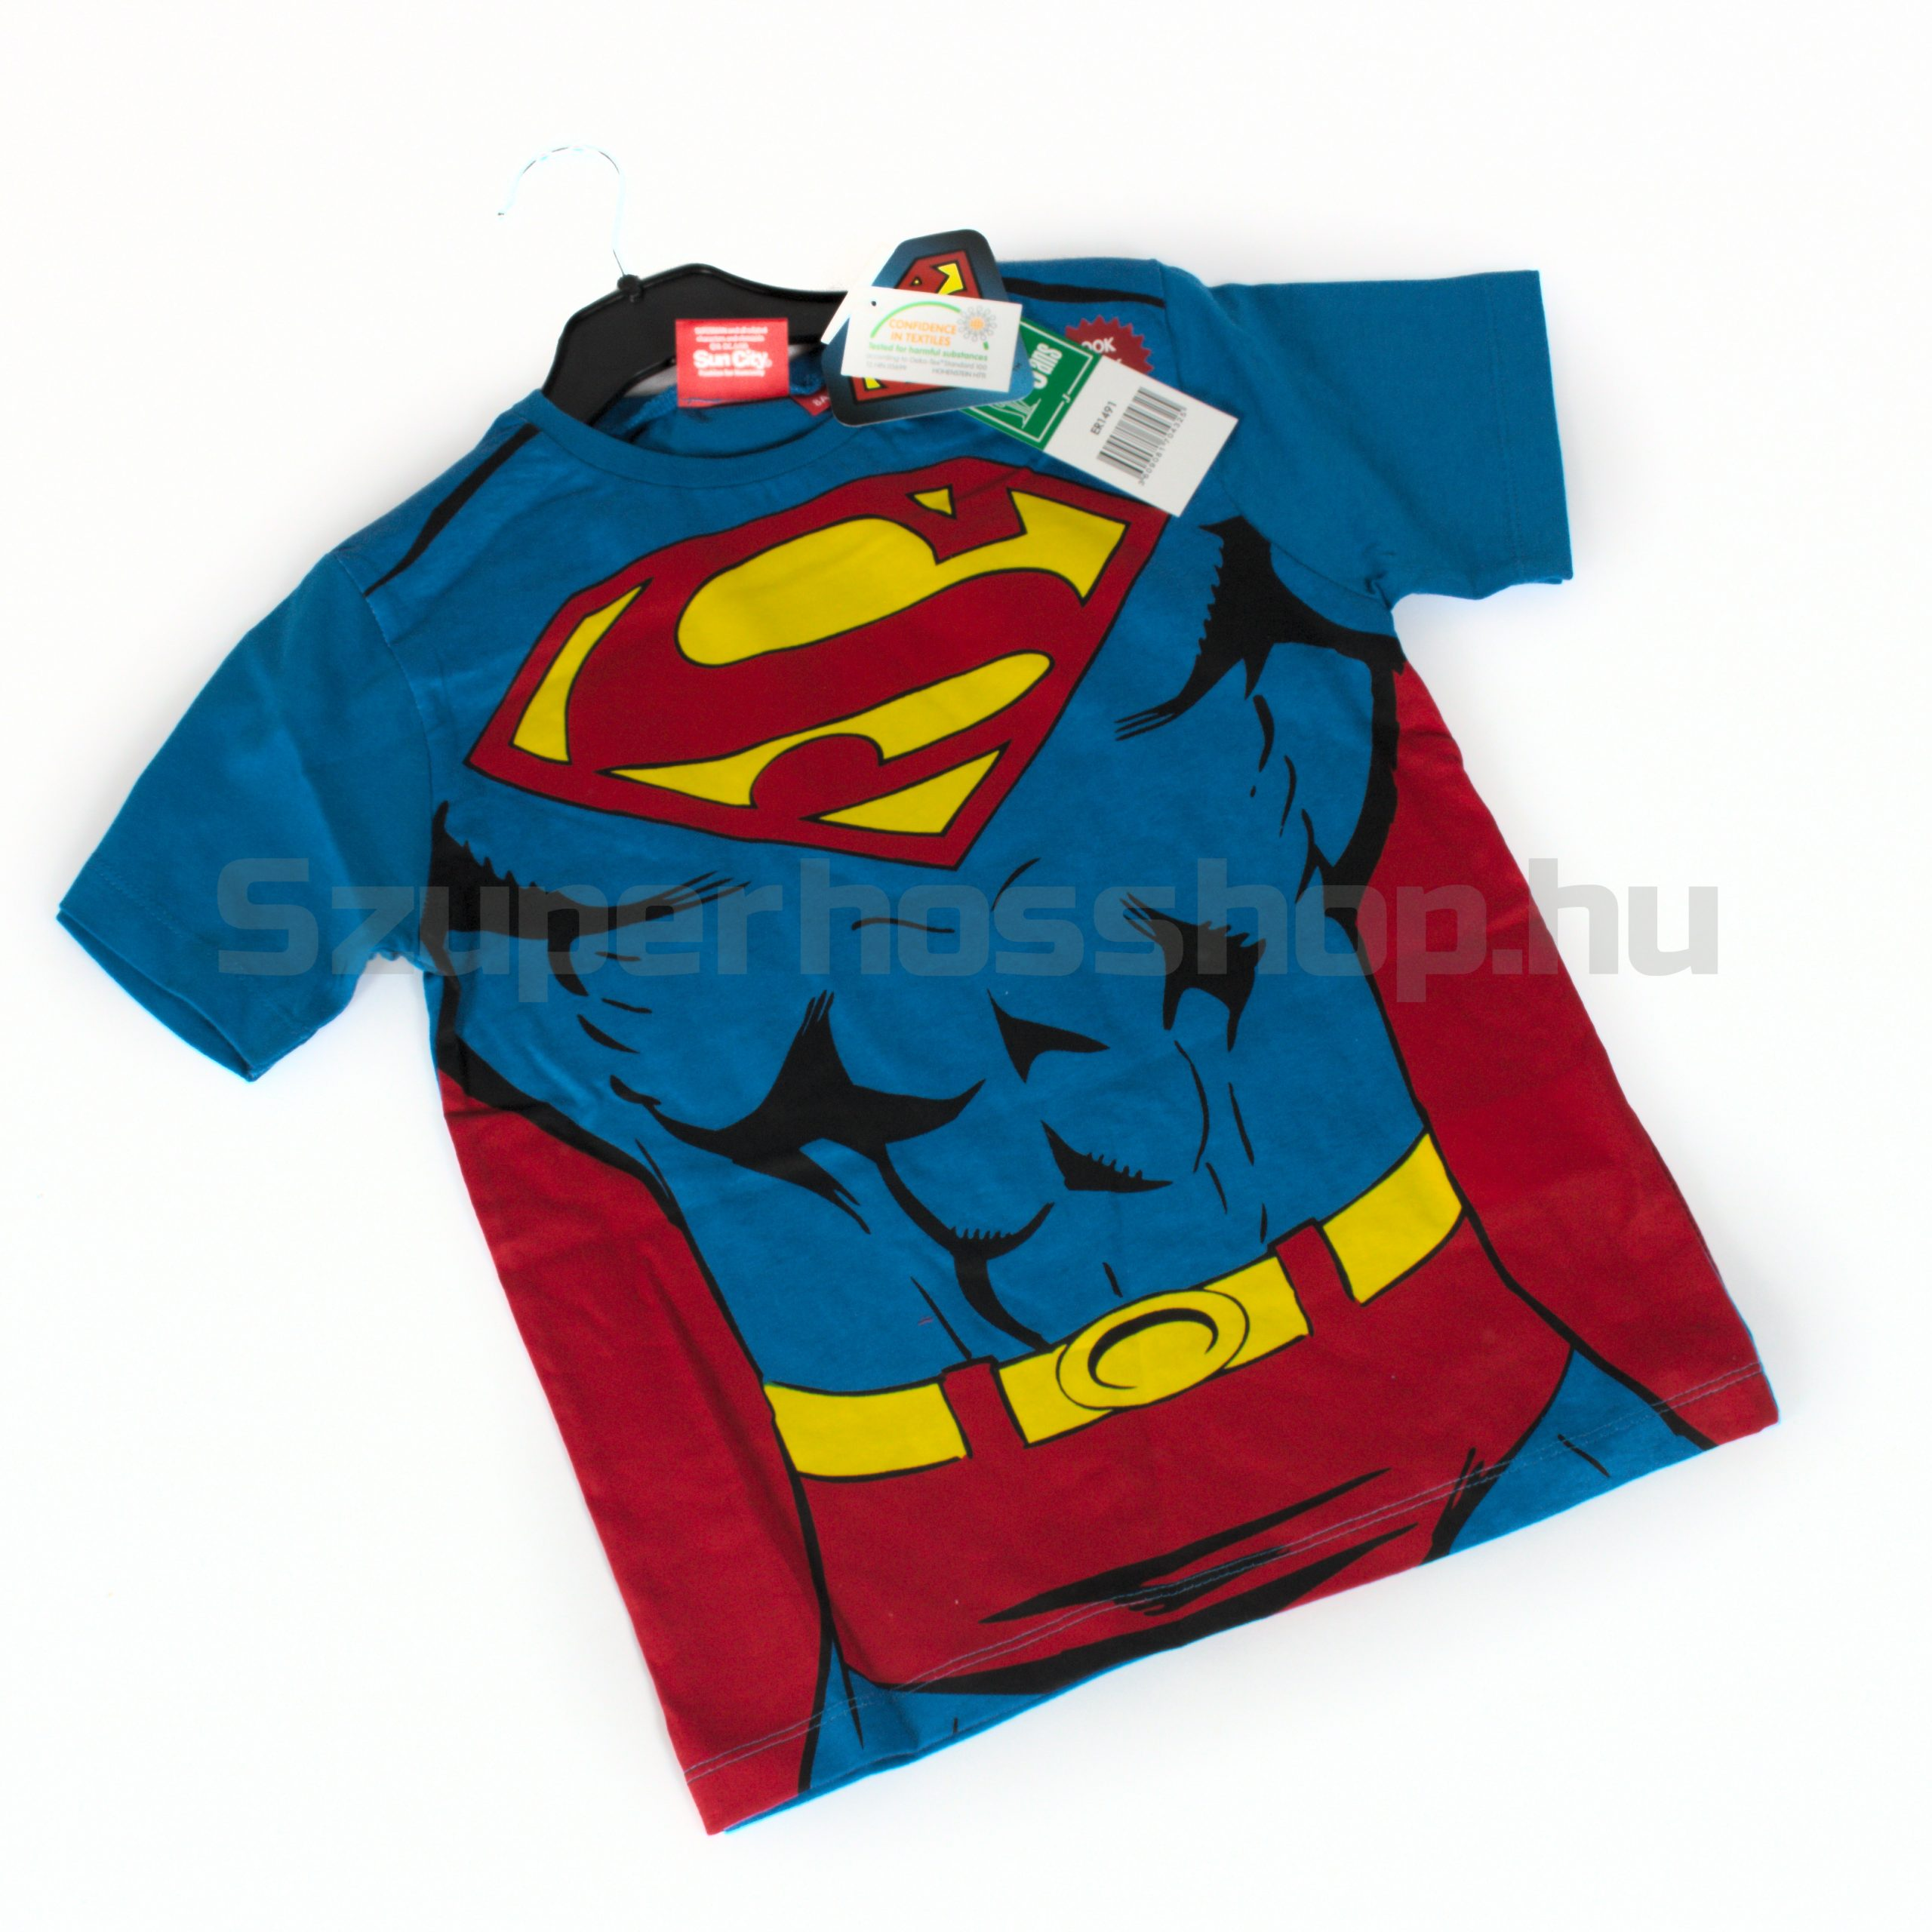 Superman rövidujjú póló